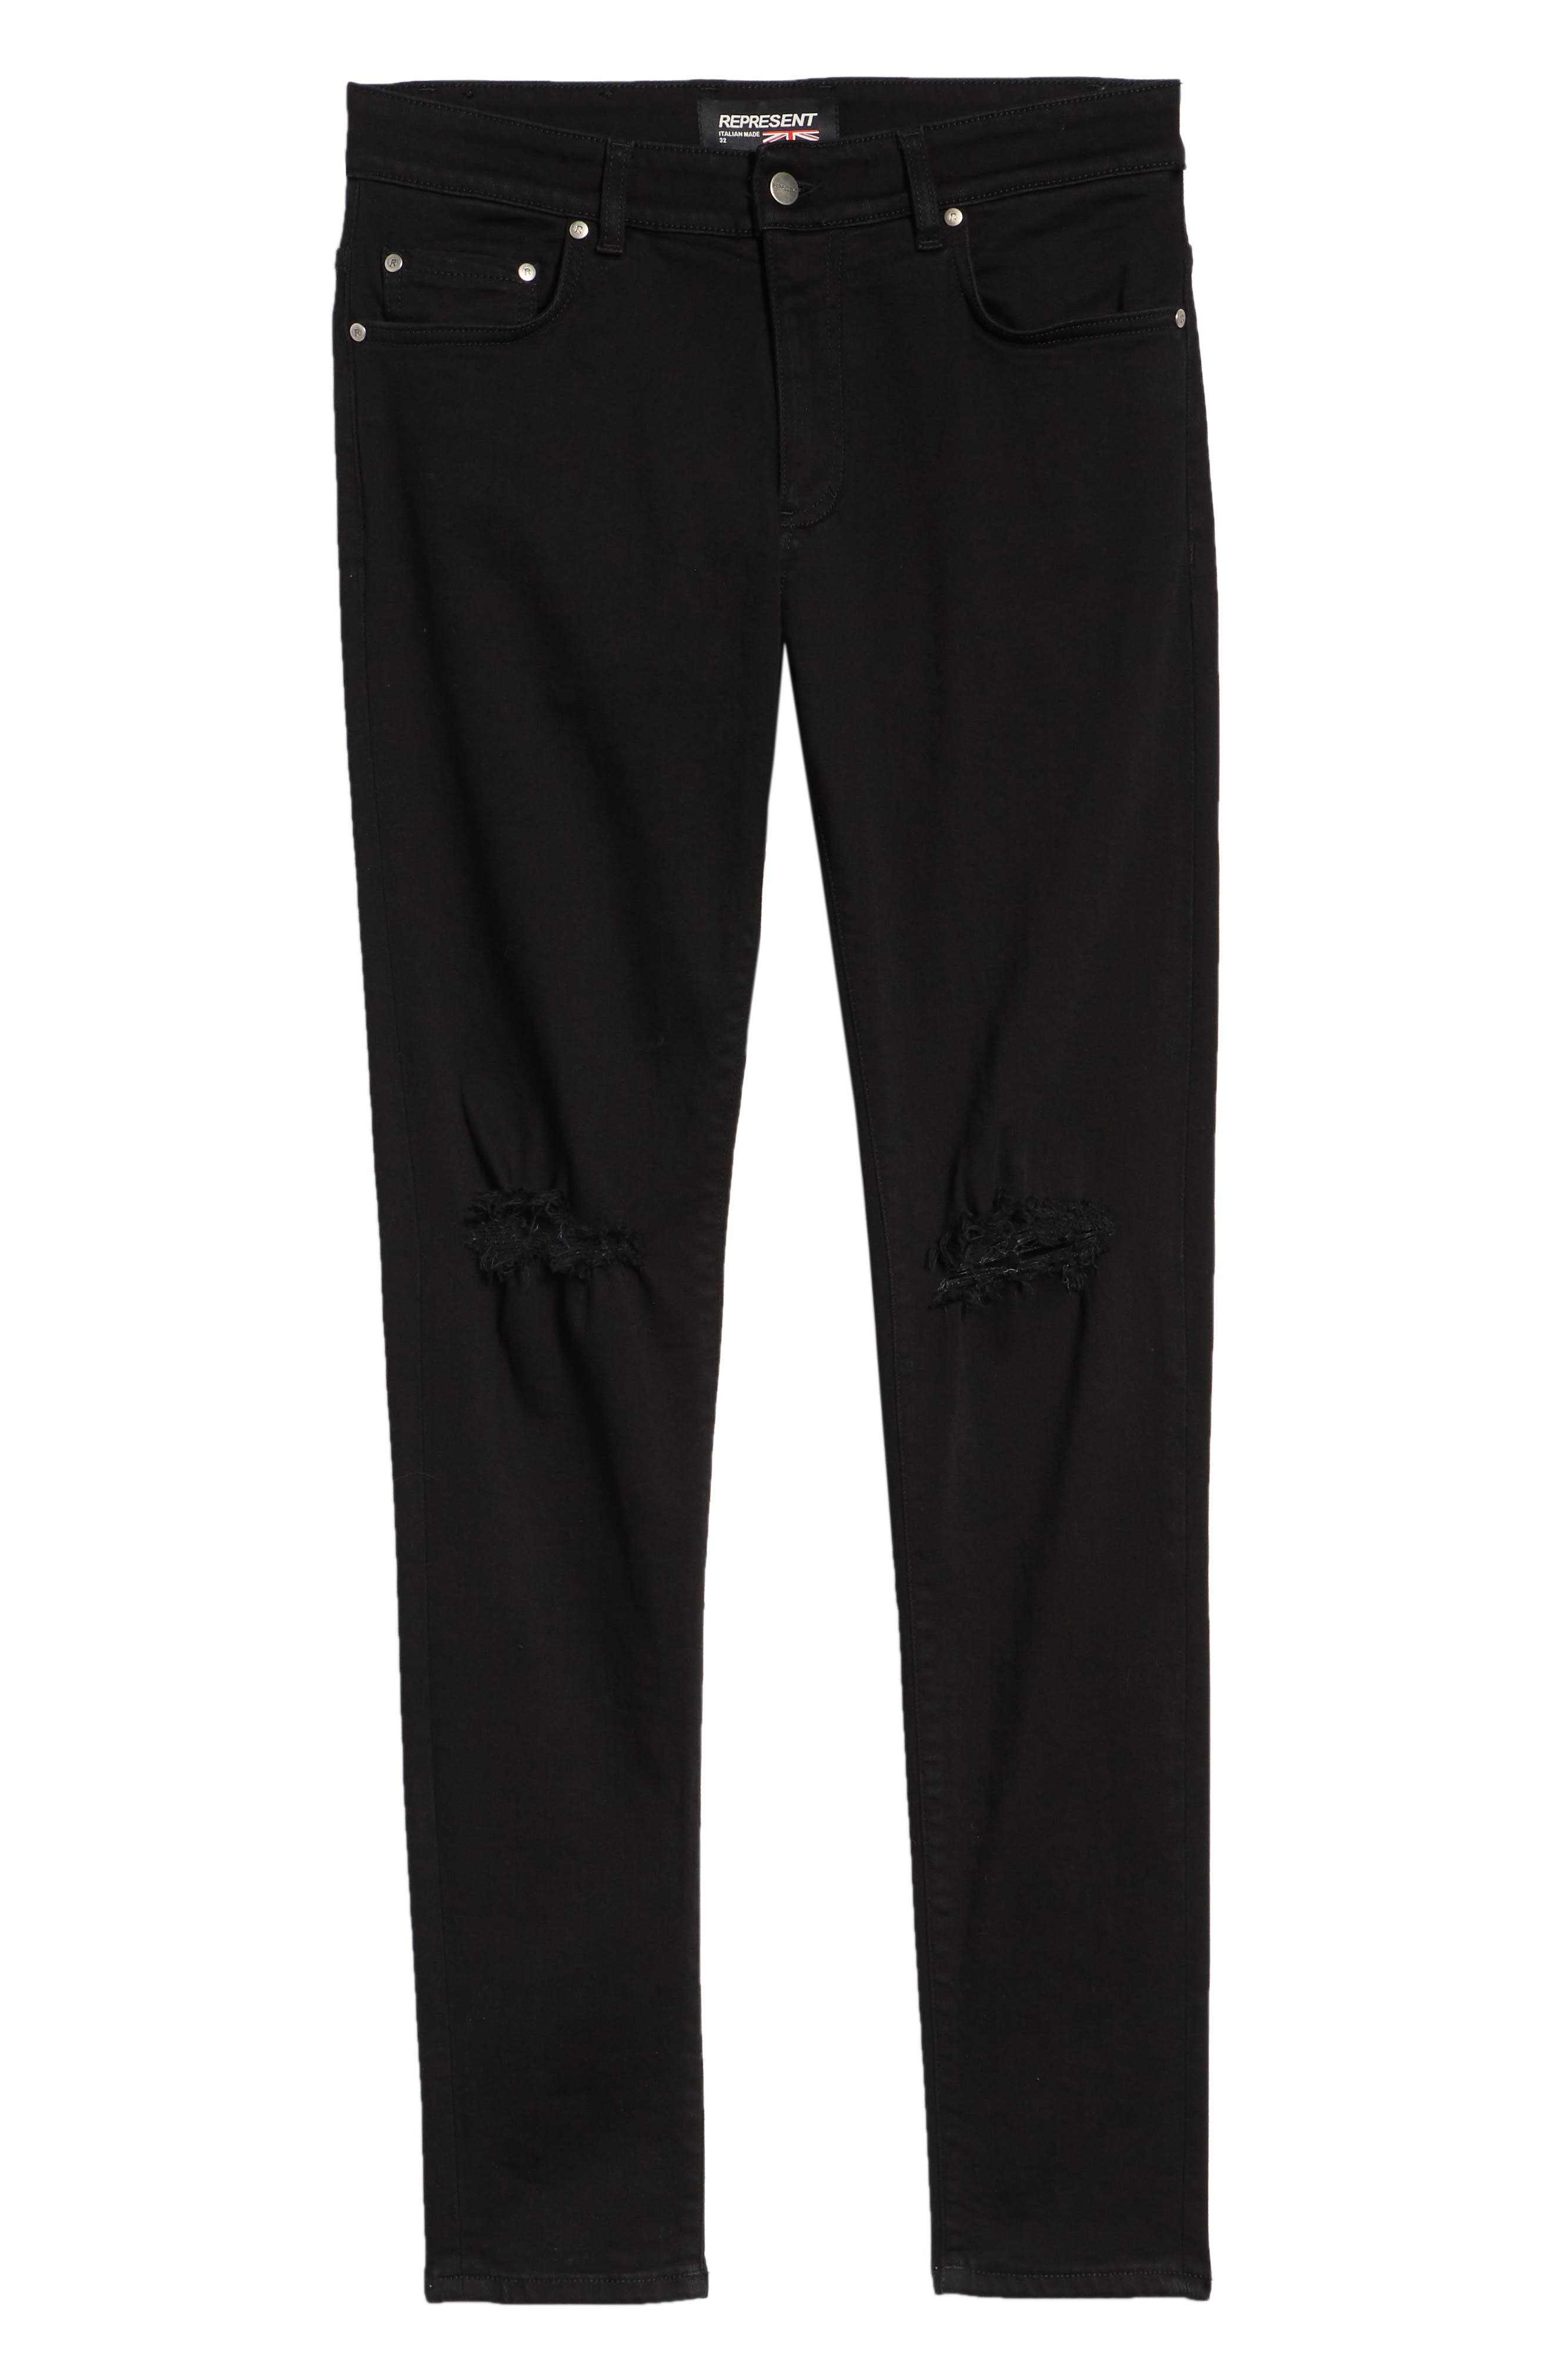 Destroyer Ripped Slim Fit Jeans,                             Alternate thumbnail 6, color,                             BLACK